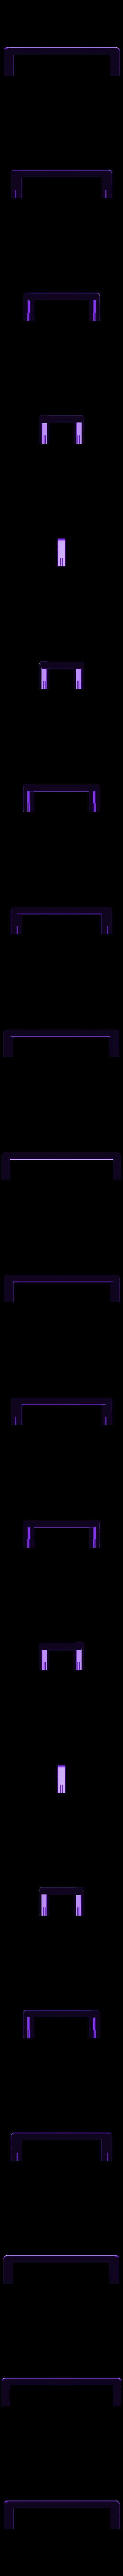 boomypi-handle-bar.stl Download free STL file Raspberry Pi Airplay BoomBox • 3D printer template, Adafruit